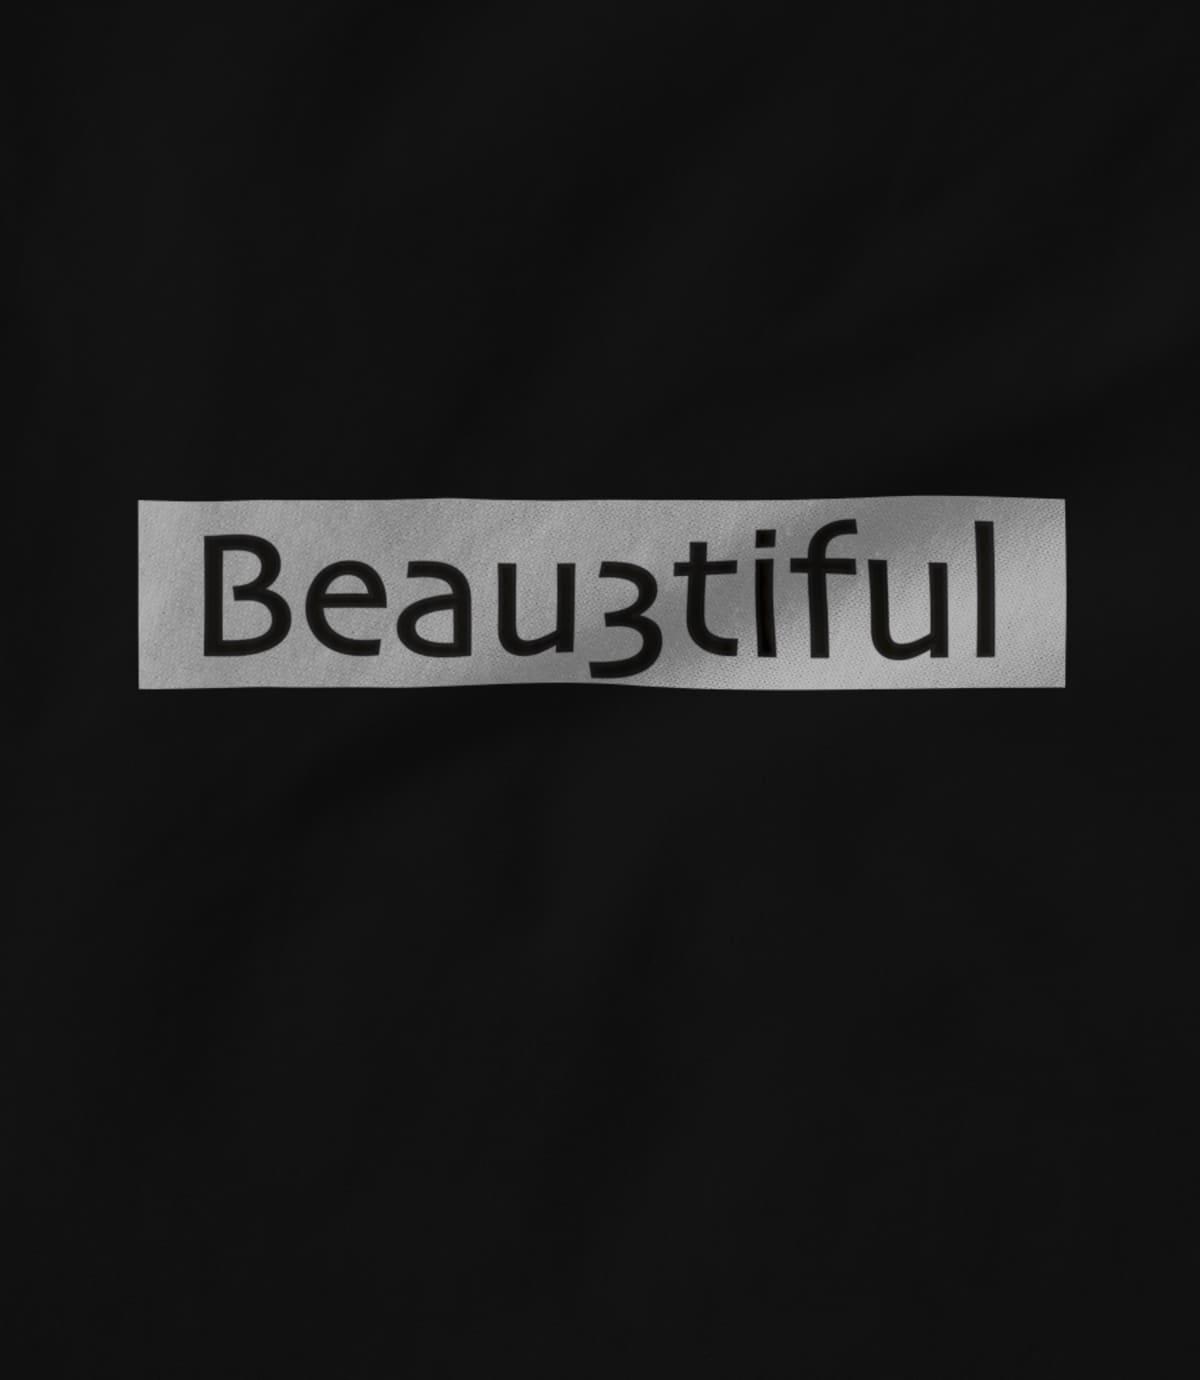 Beau3tiful